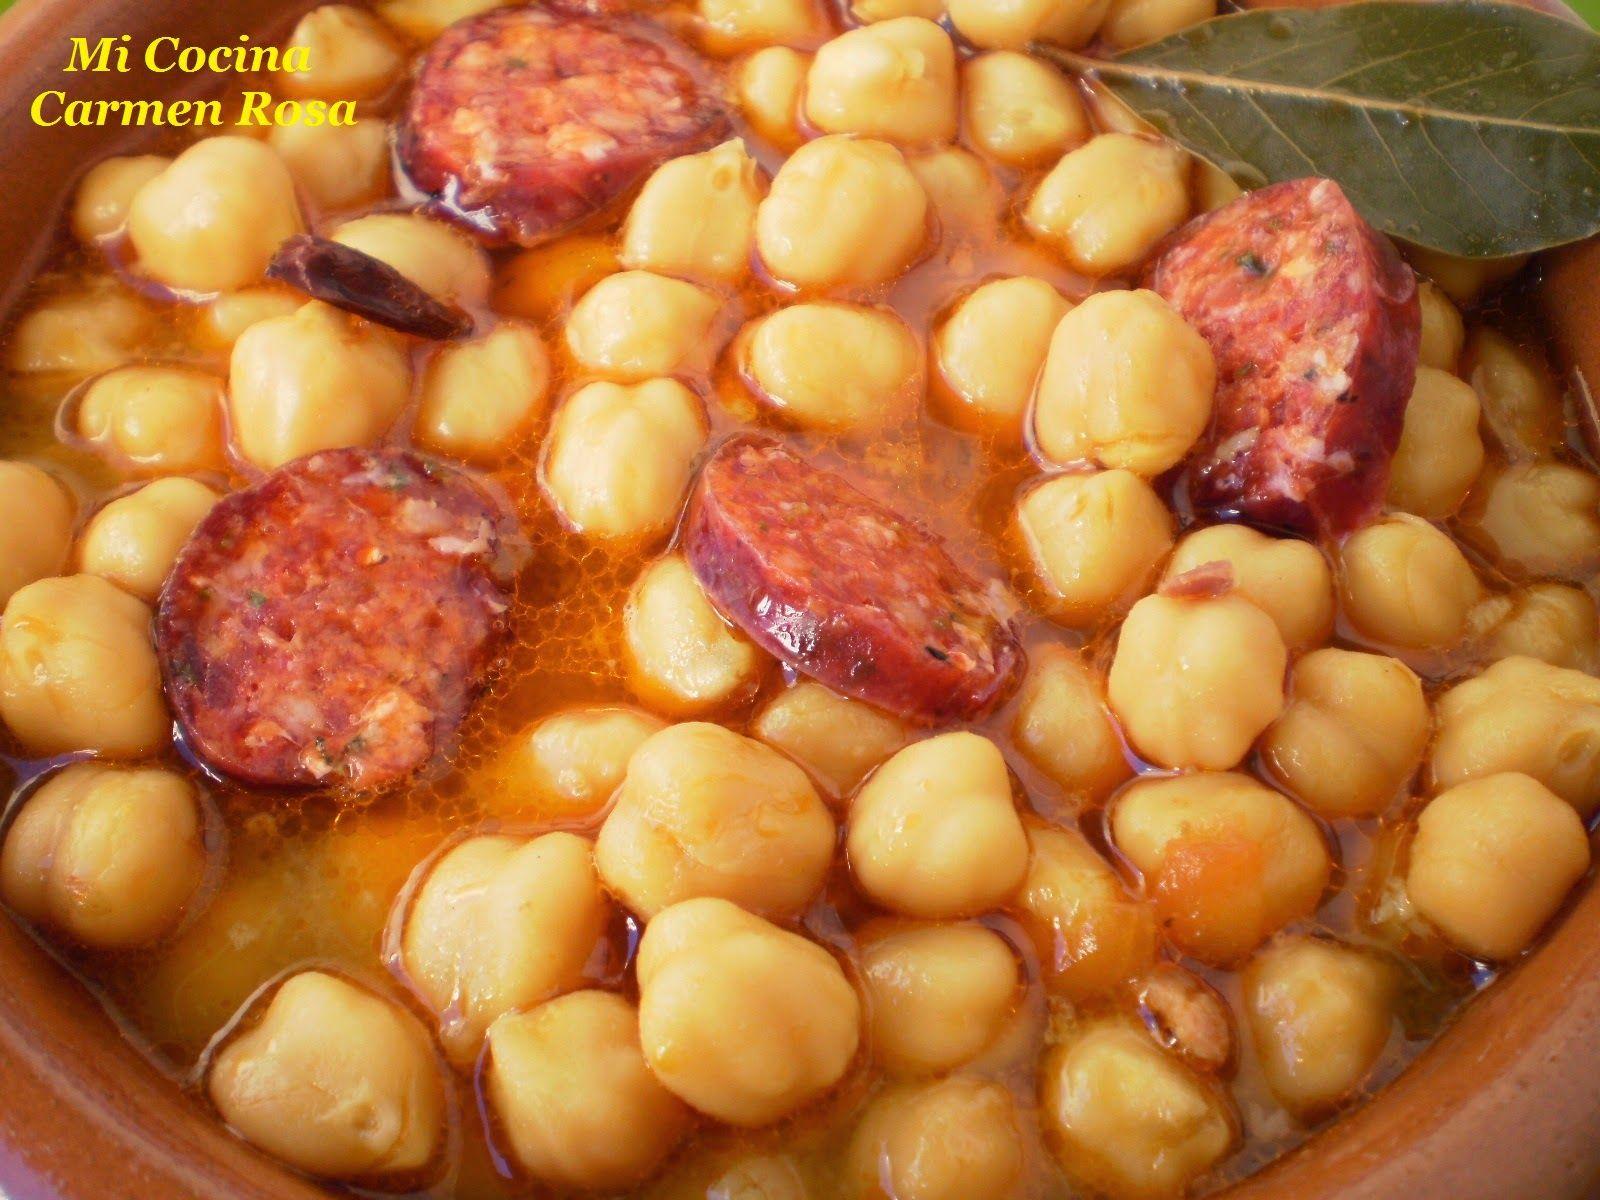 Mi Cocina Potaje De Garbanzos Con Chorizo Garbanzos Con Chorizo Garbanzos Verduras